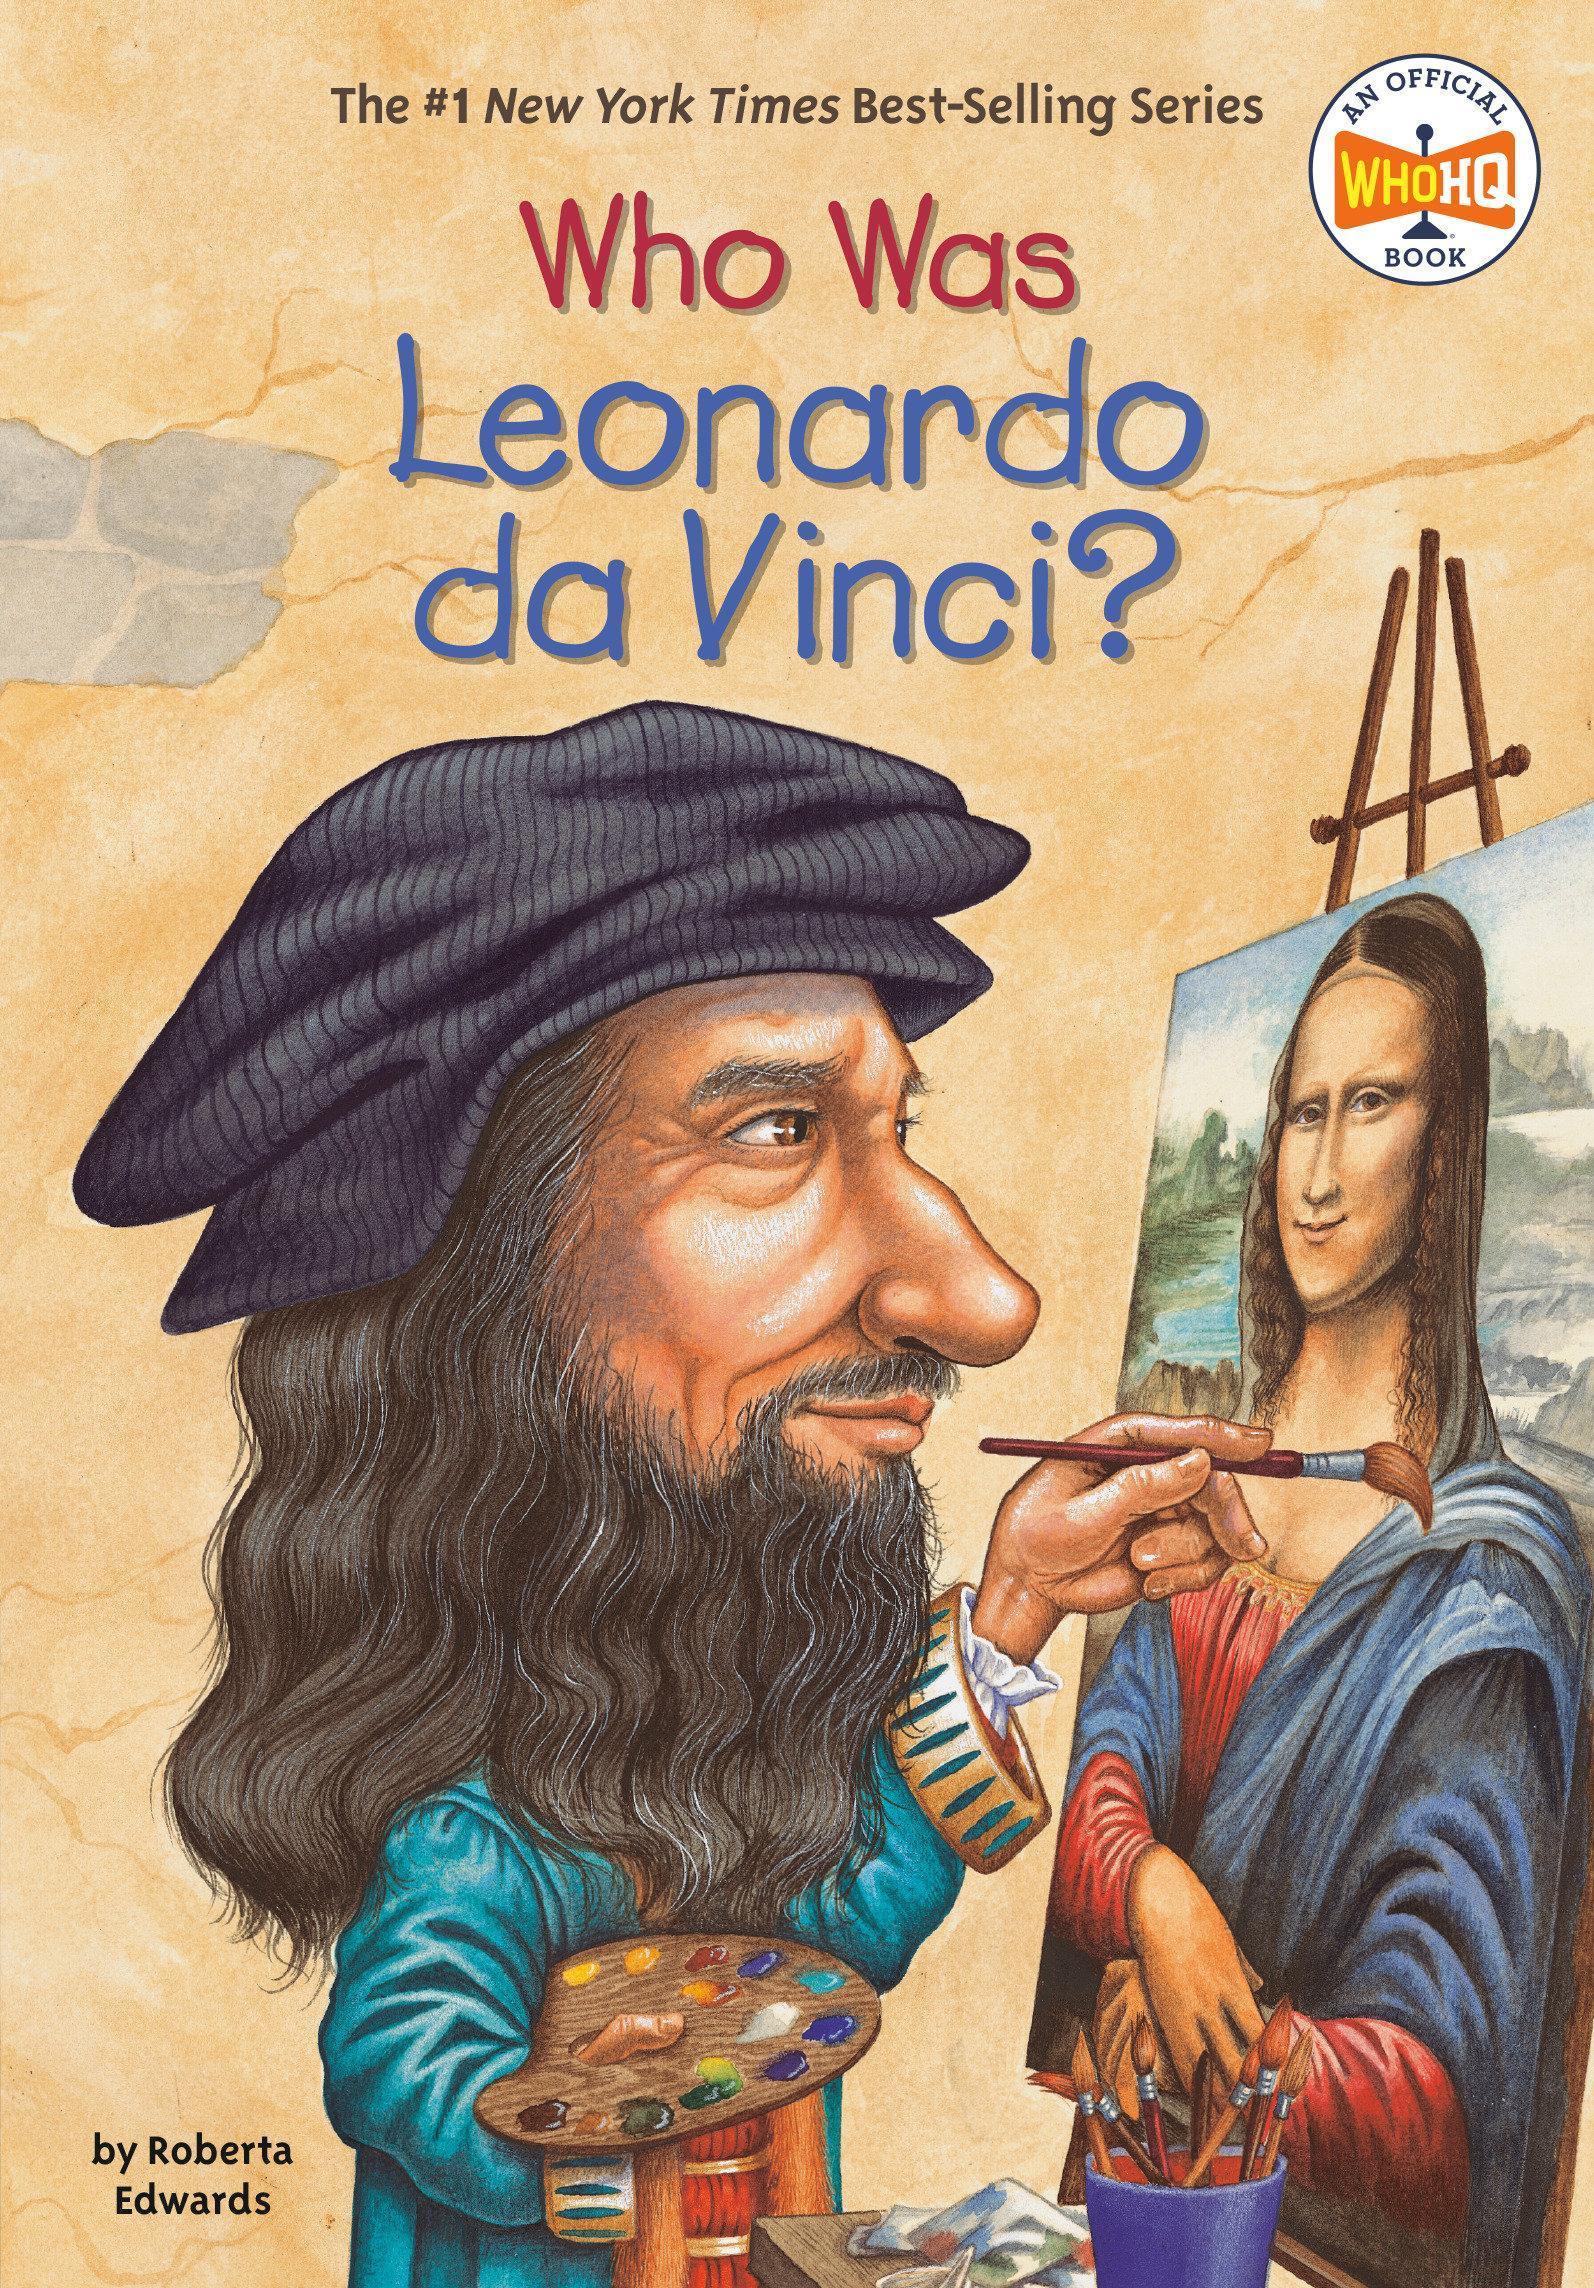 Who Was Leonardo Da Vinci?, Roberta Edwards